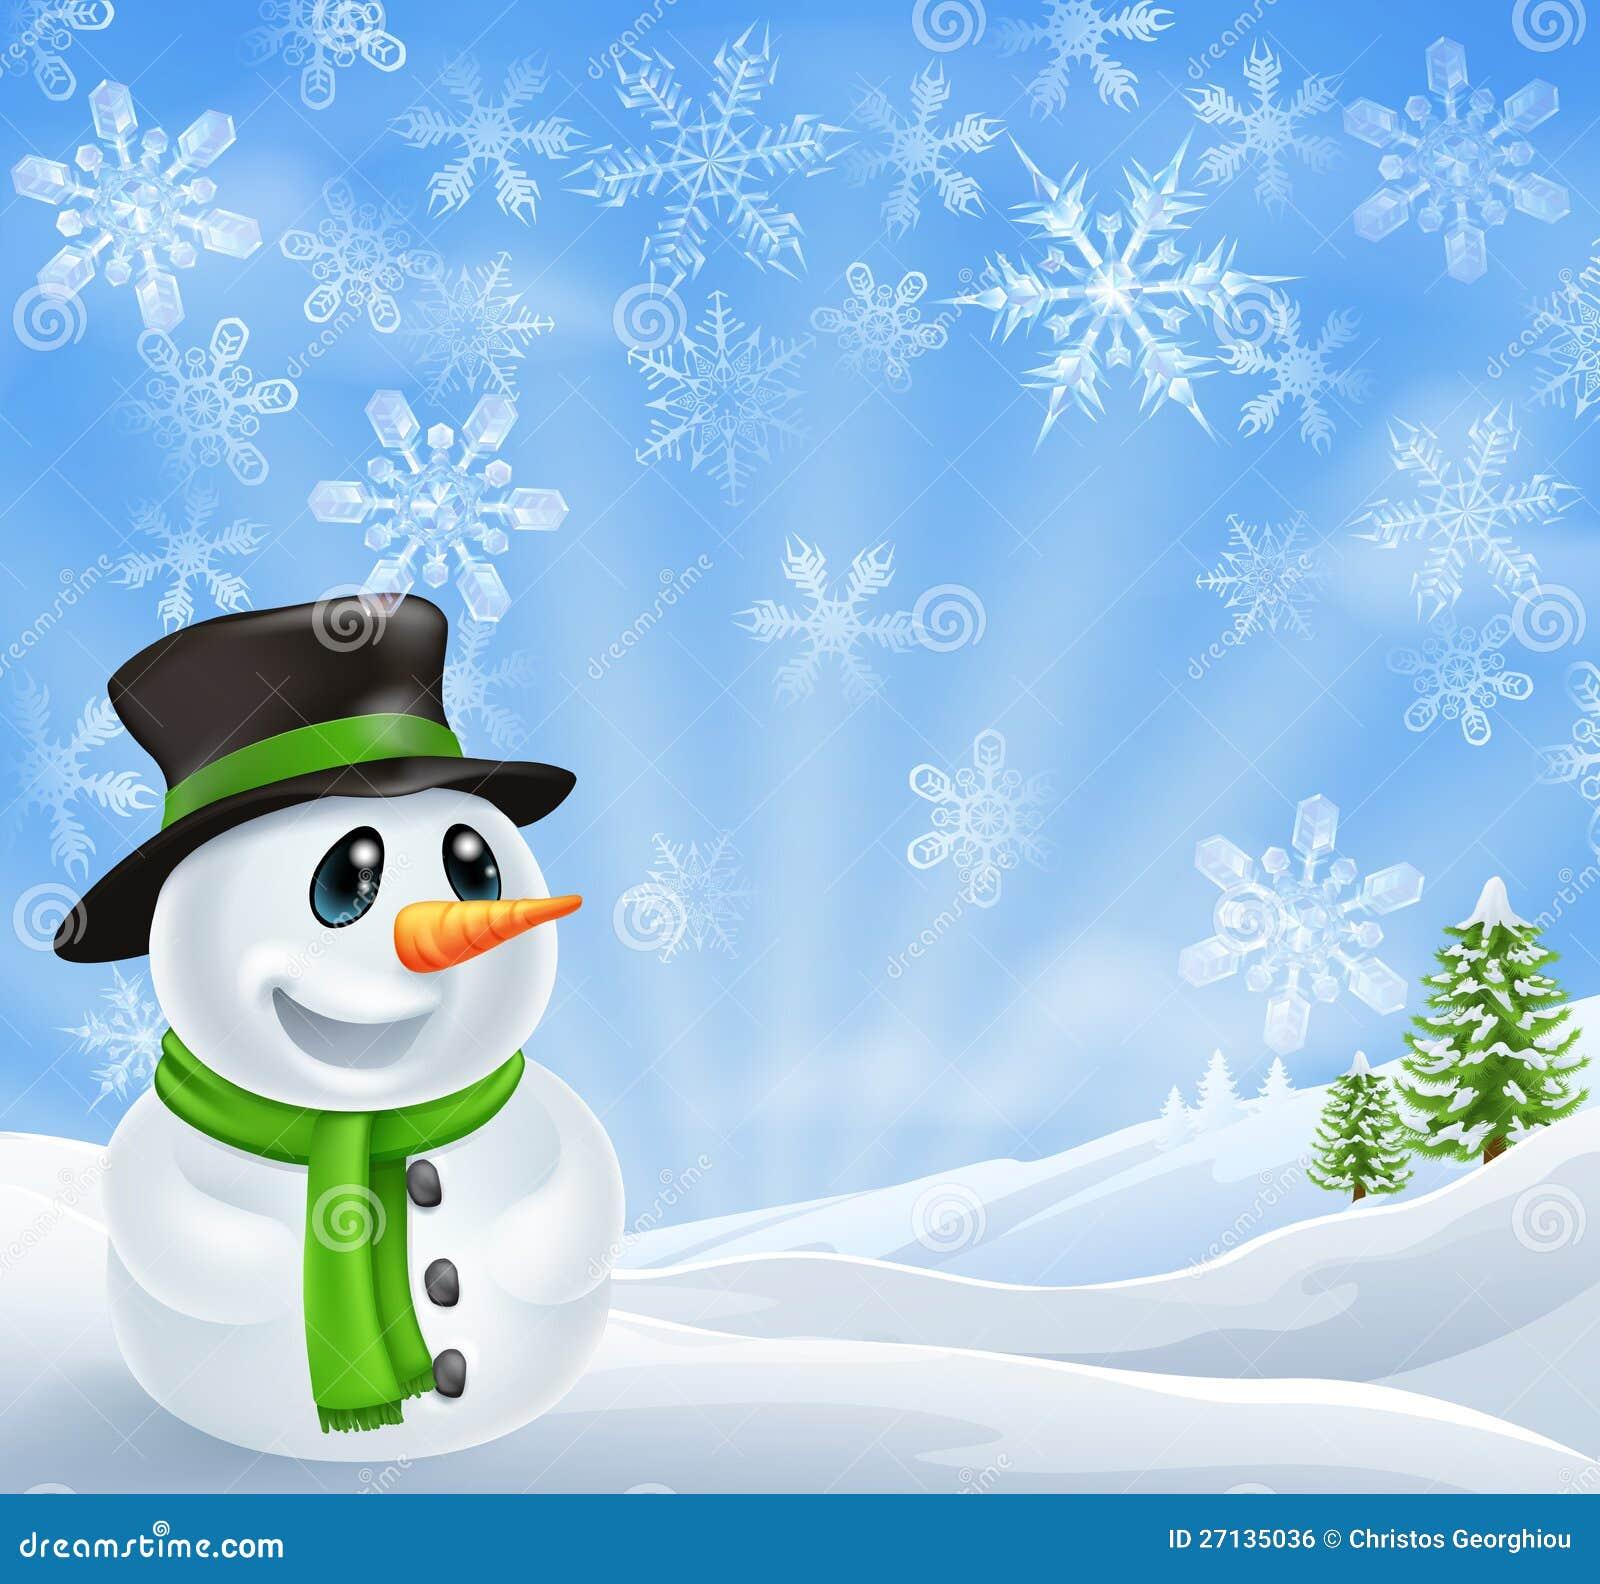 Christmas Snowman Scene Royalty Free Stock Image - Image: 27135036